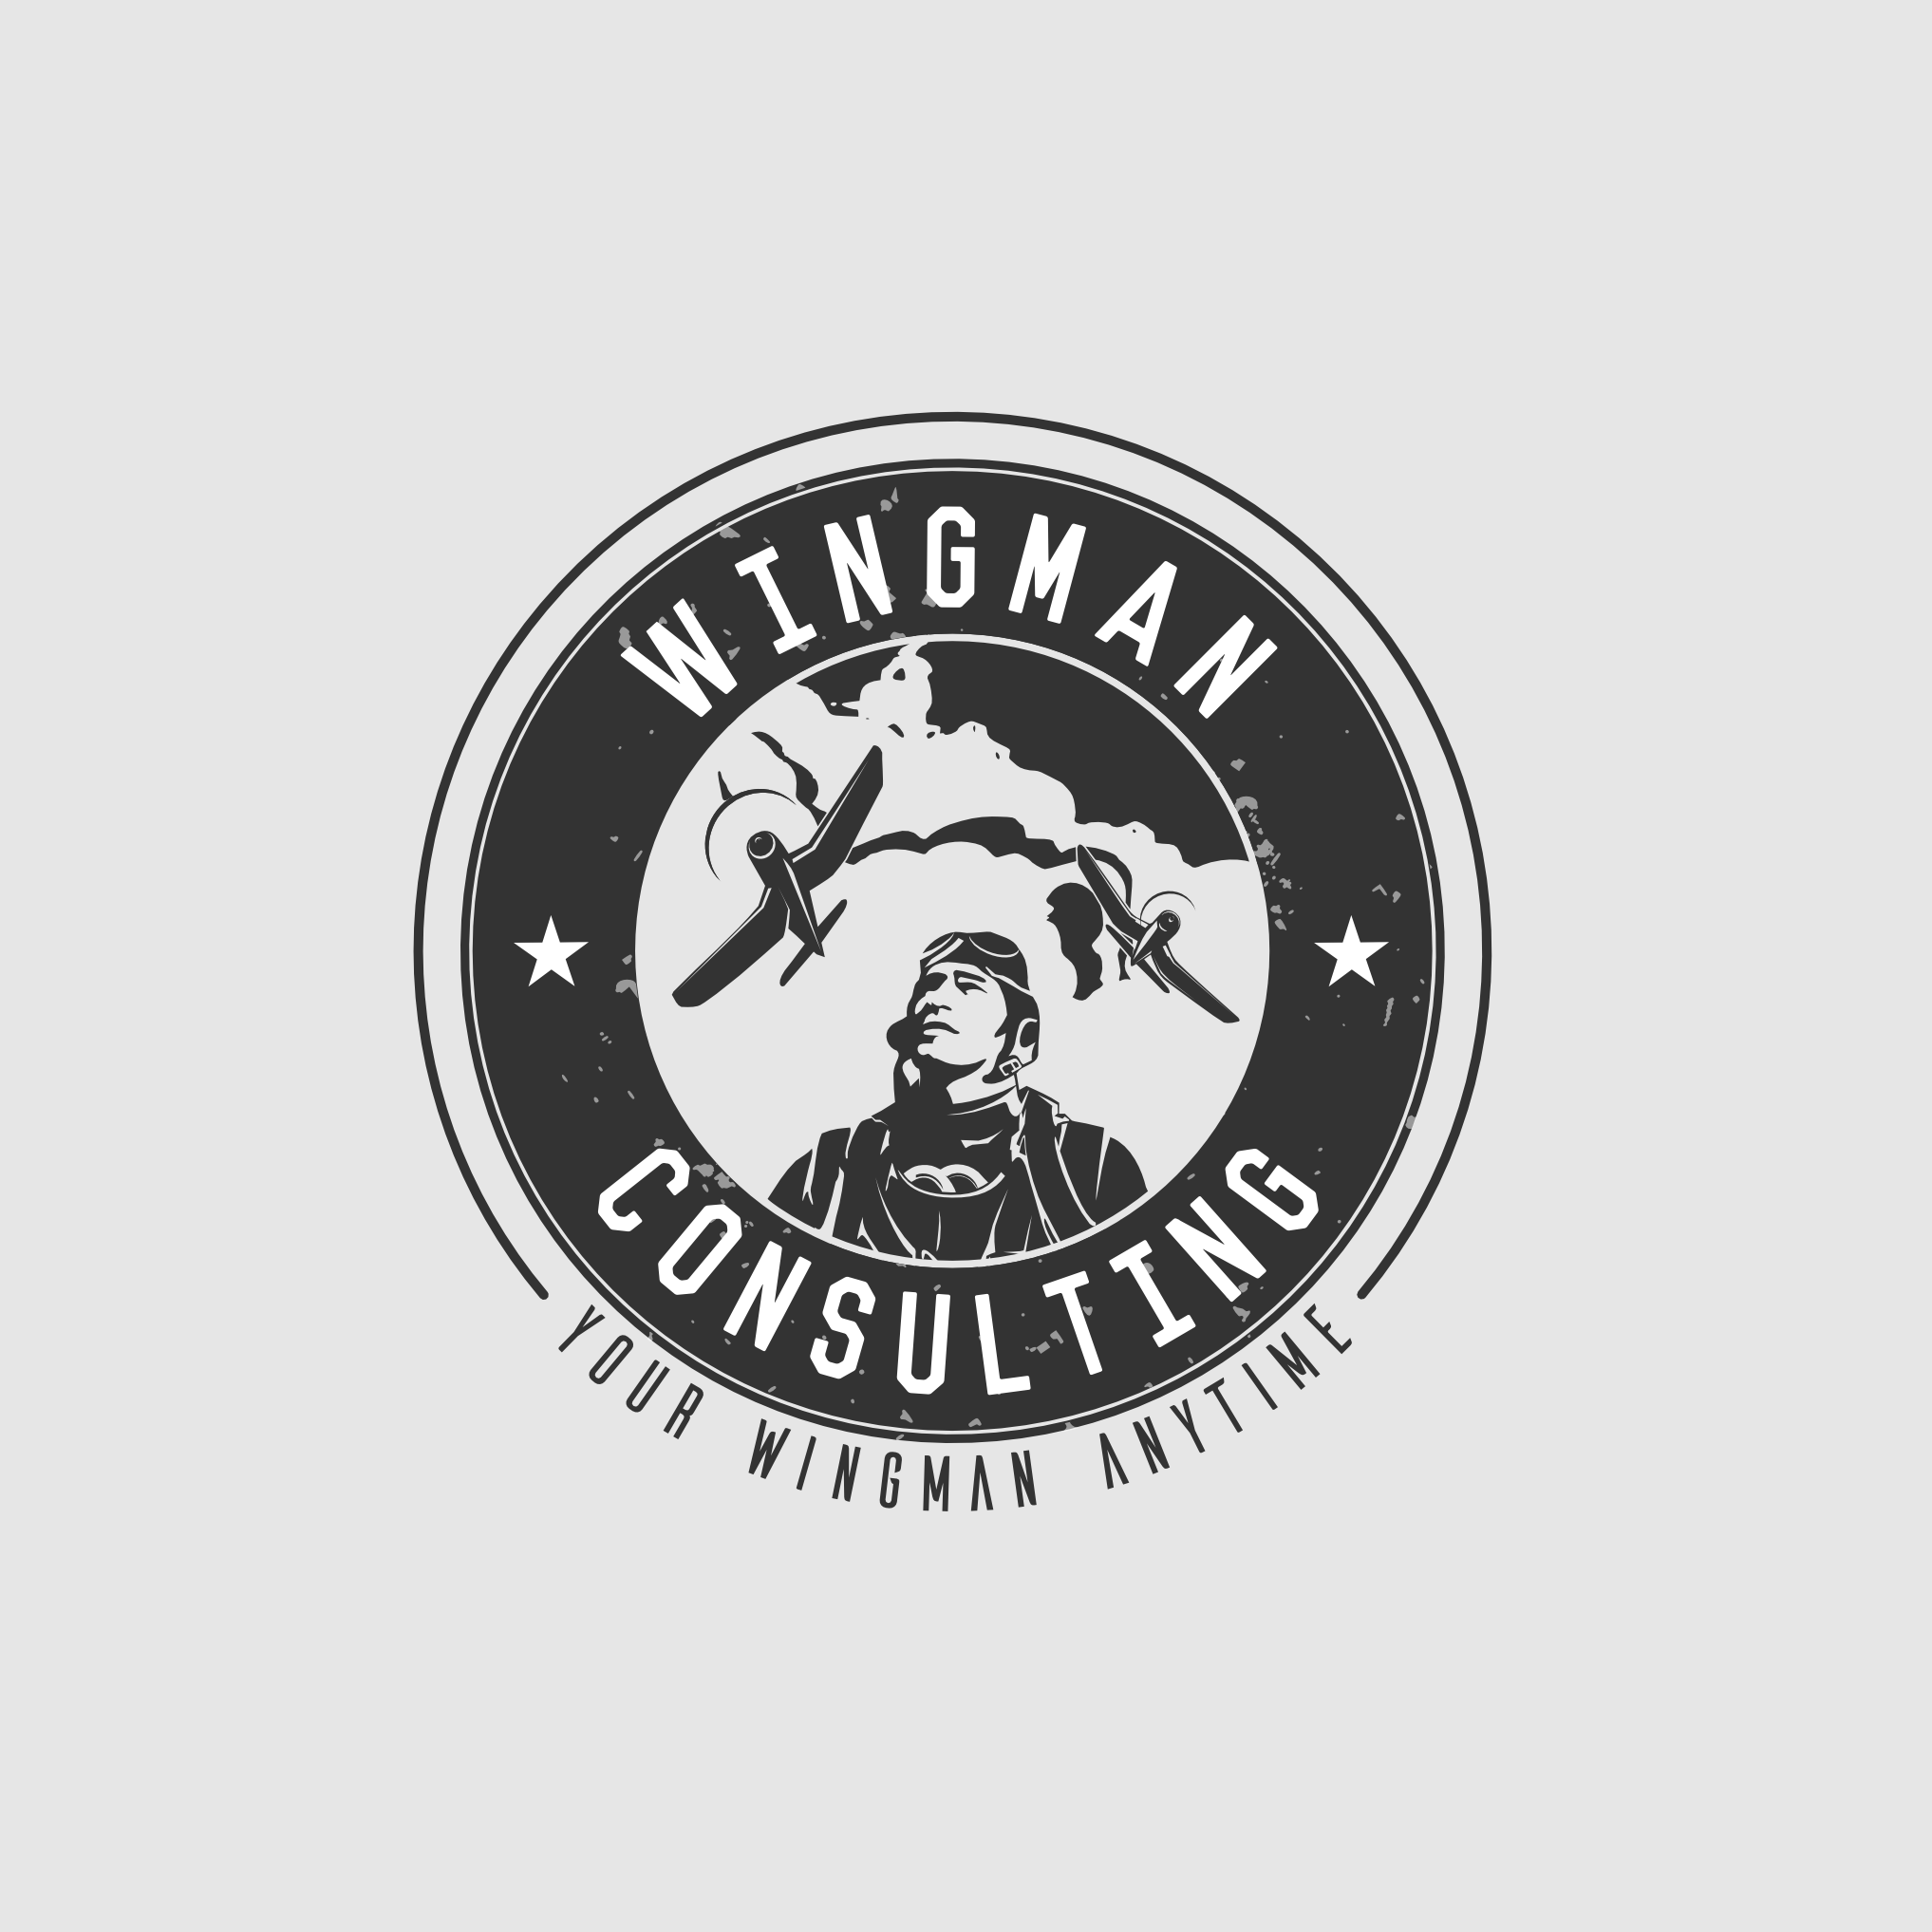 Wingman Consulting